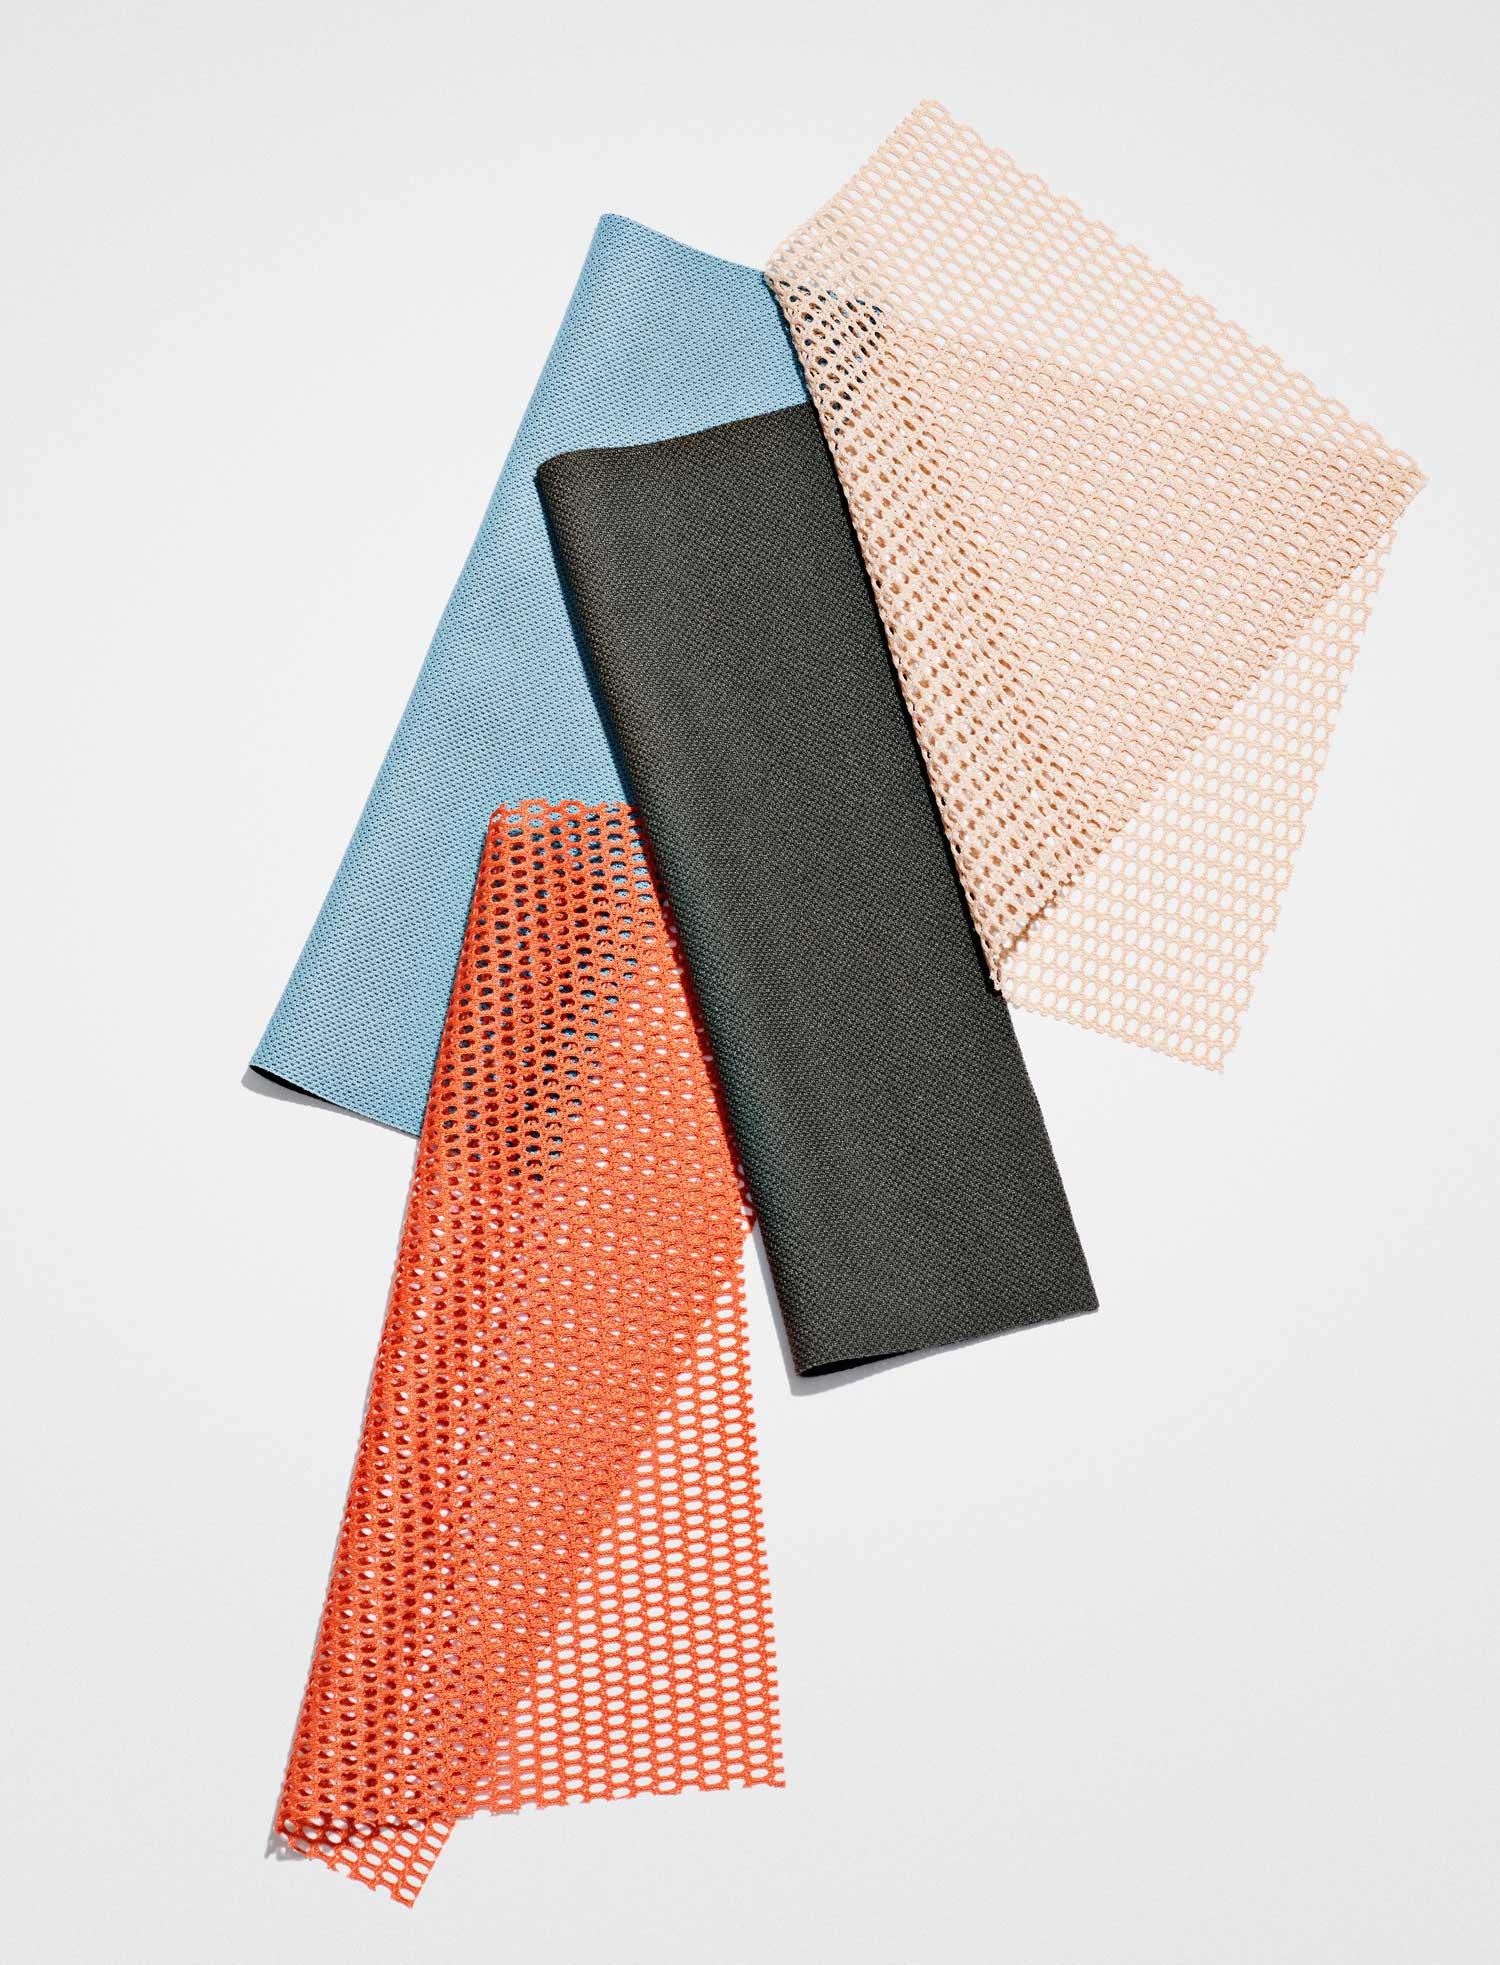 Pilotis Curtains by Doshi Levien for Kvadrat | Yellowtrace